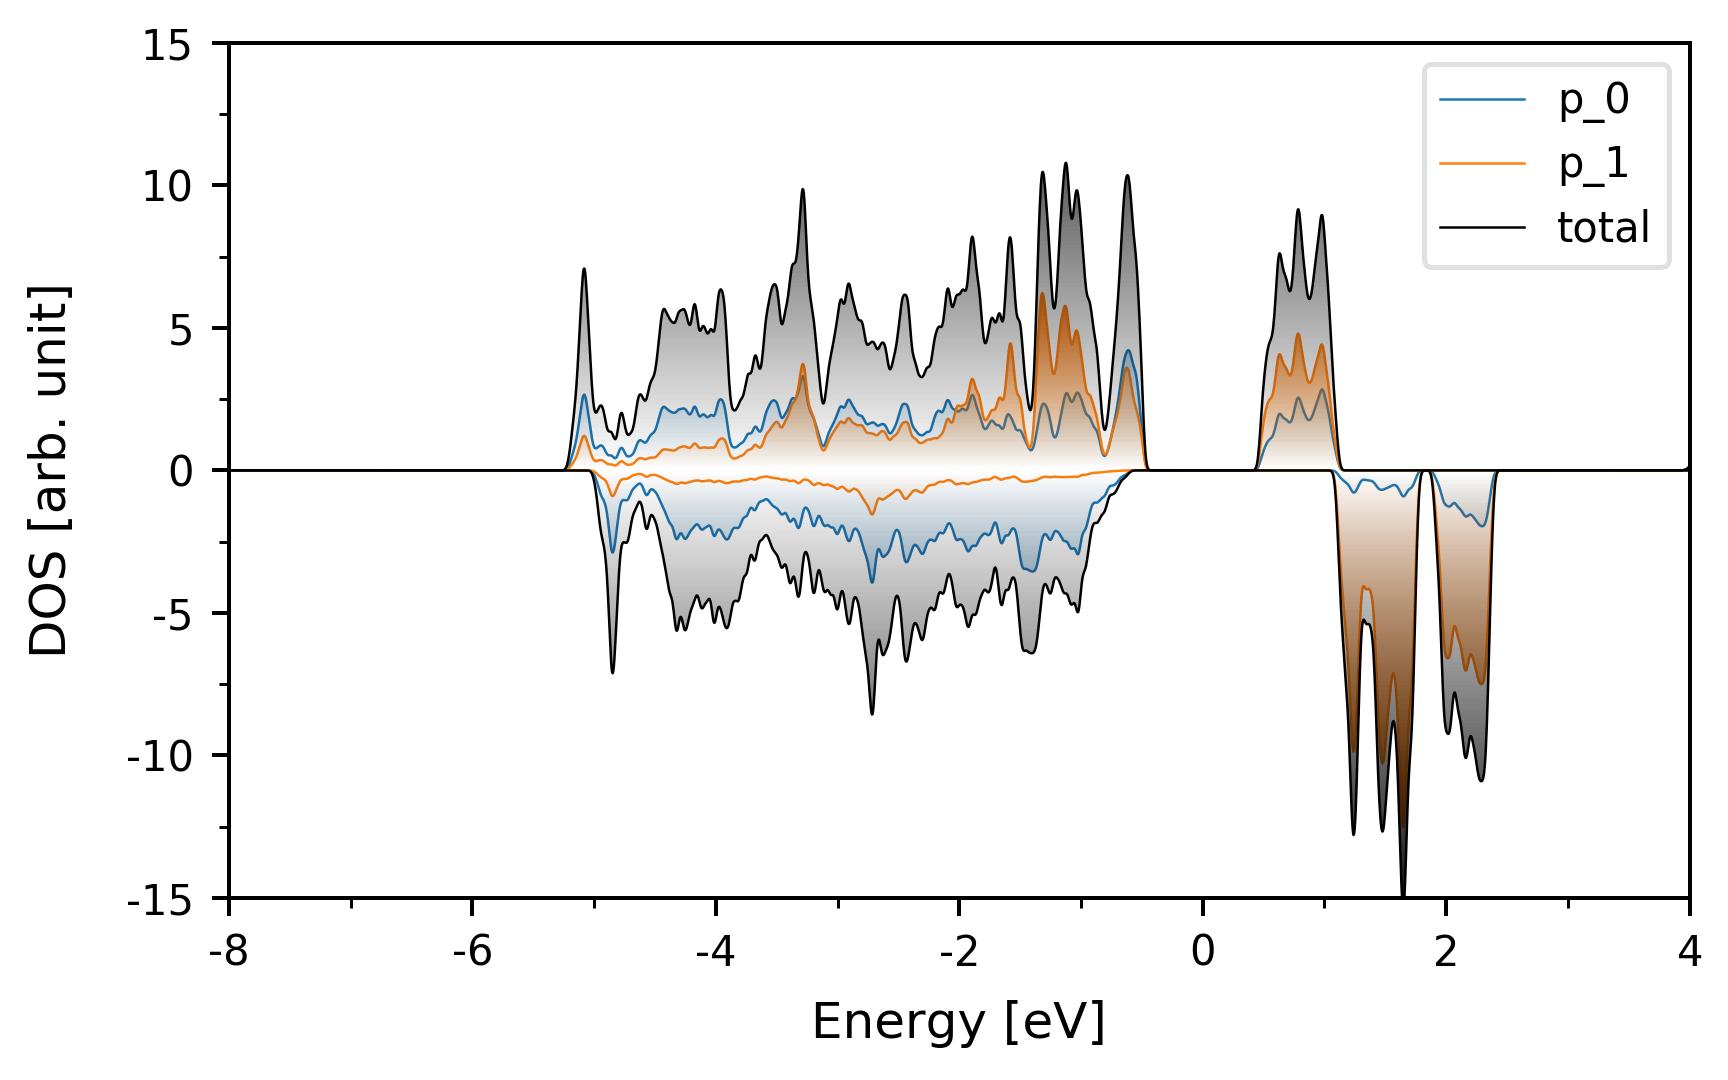 pdos of bulk CrI3 using PBE+vdw